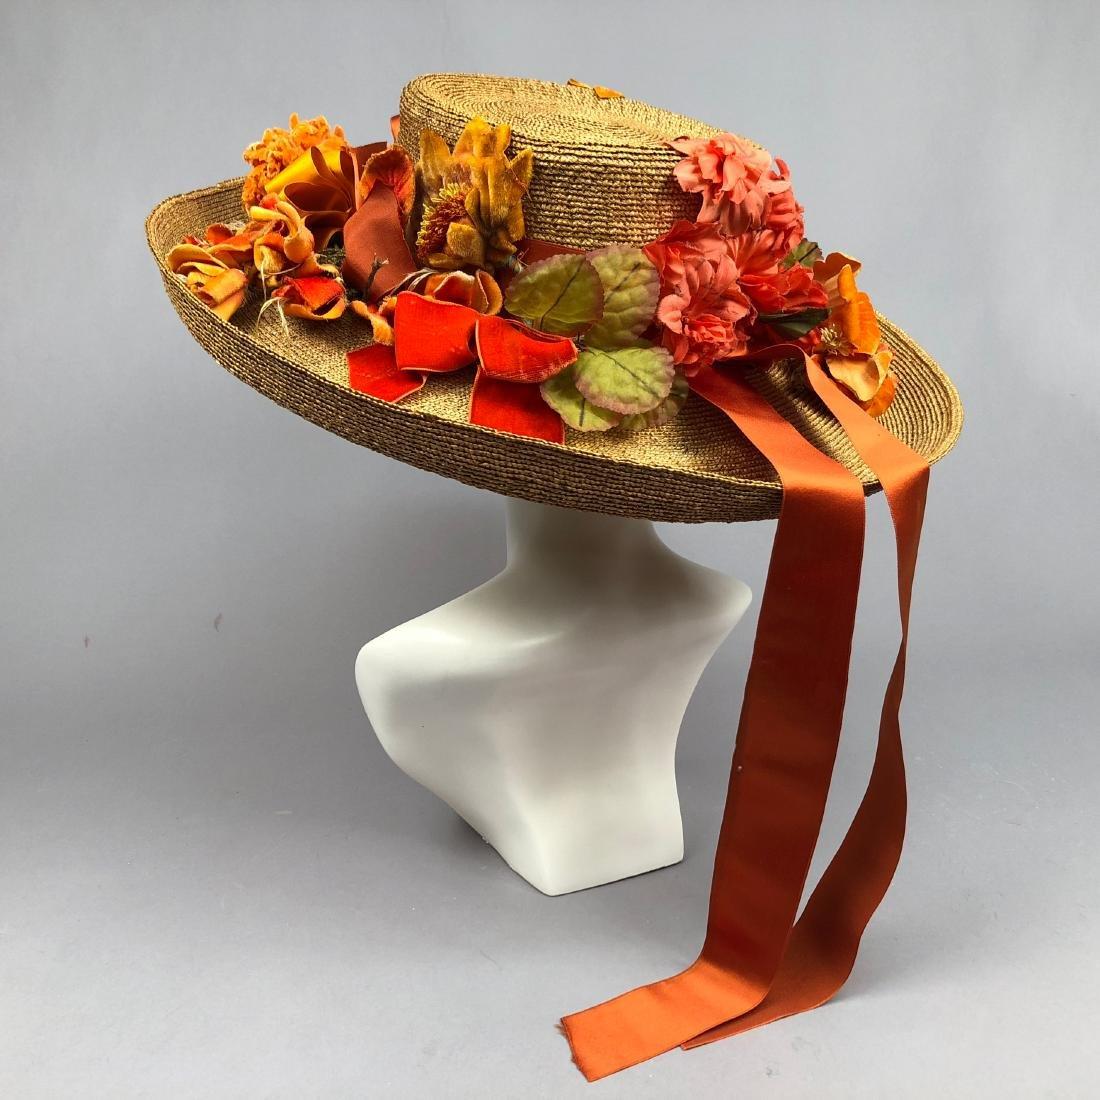 STRAW HAT with ORANGE TRIM and CORAL HATPINS, c. 1912 - 3